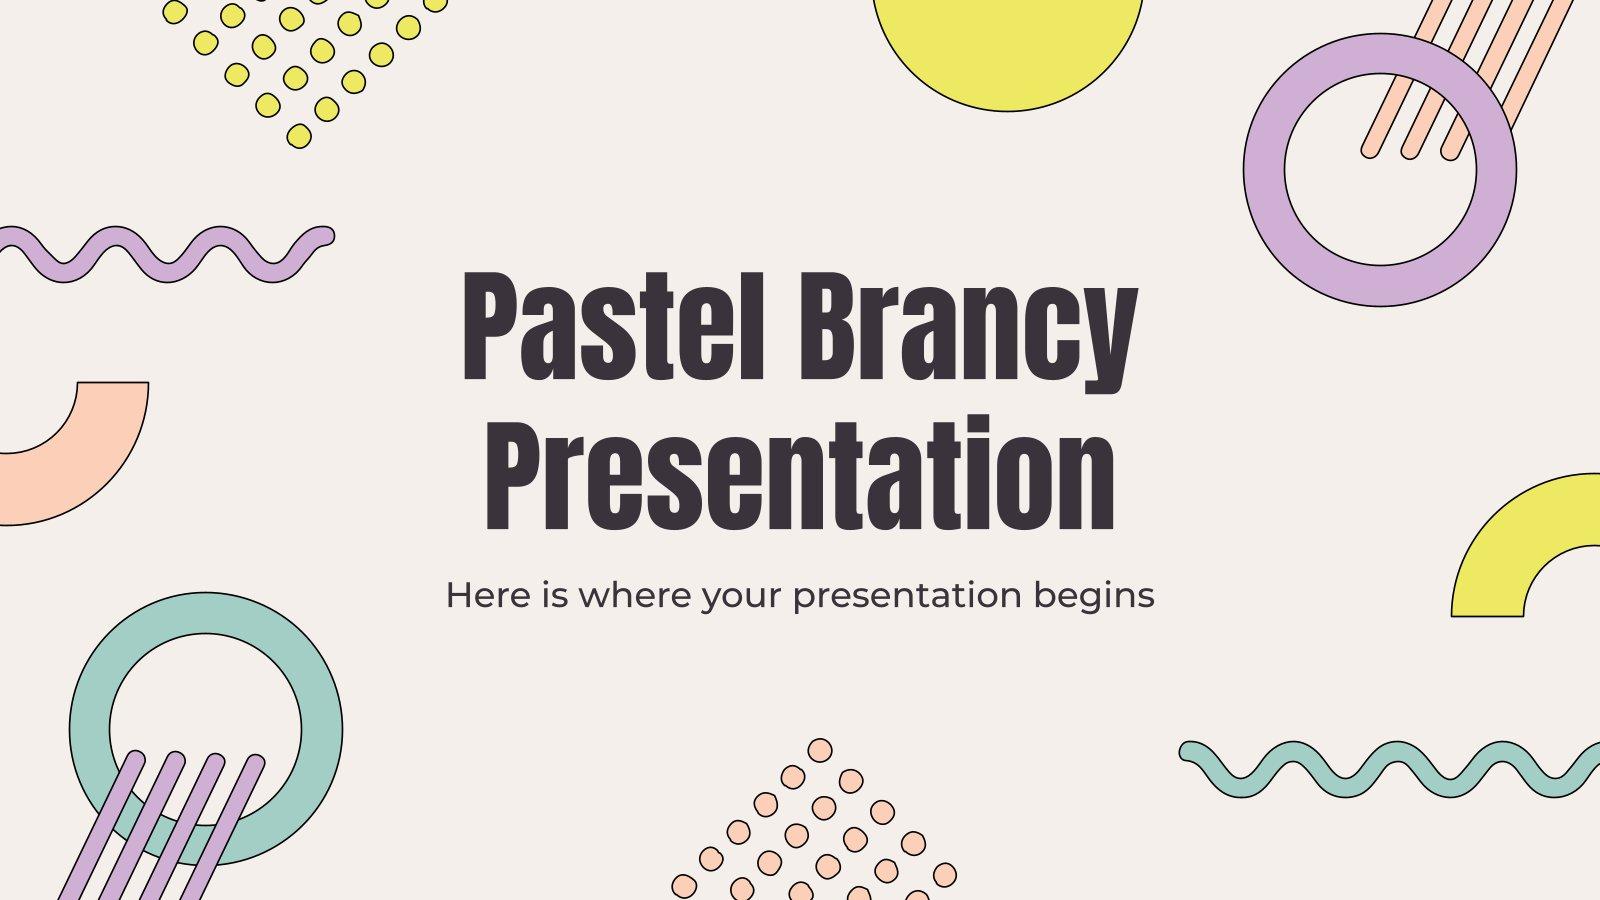 Pastel Brancy presentation template